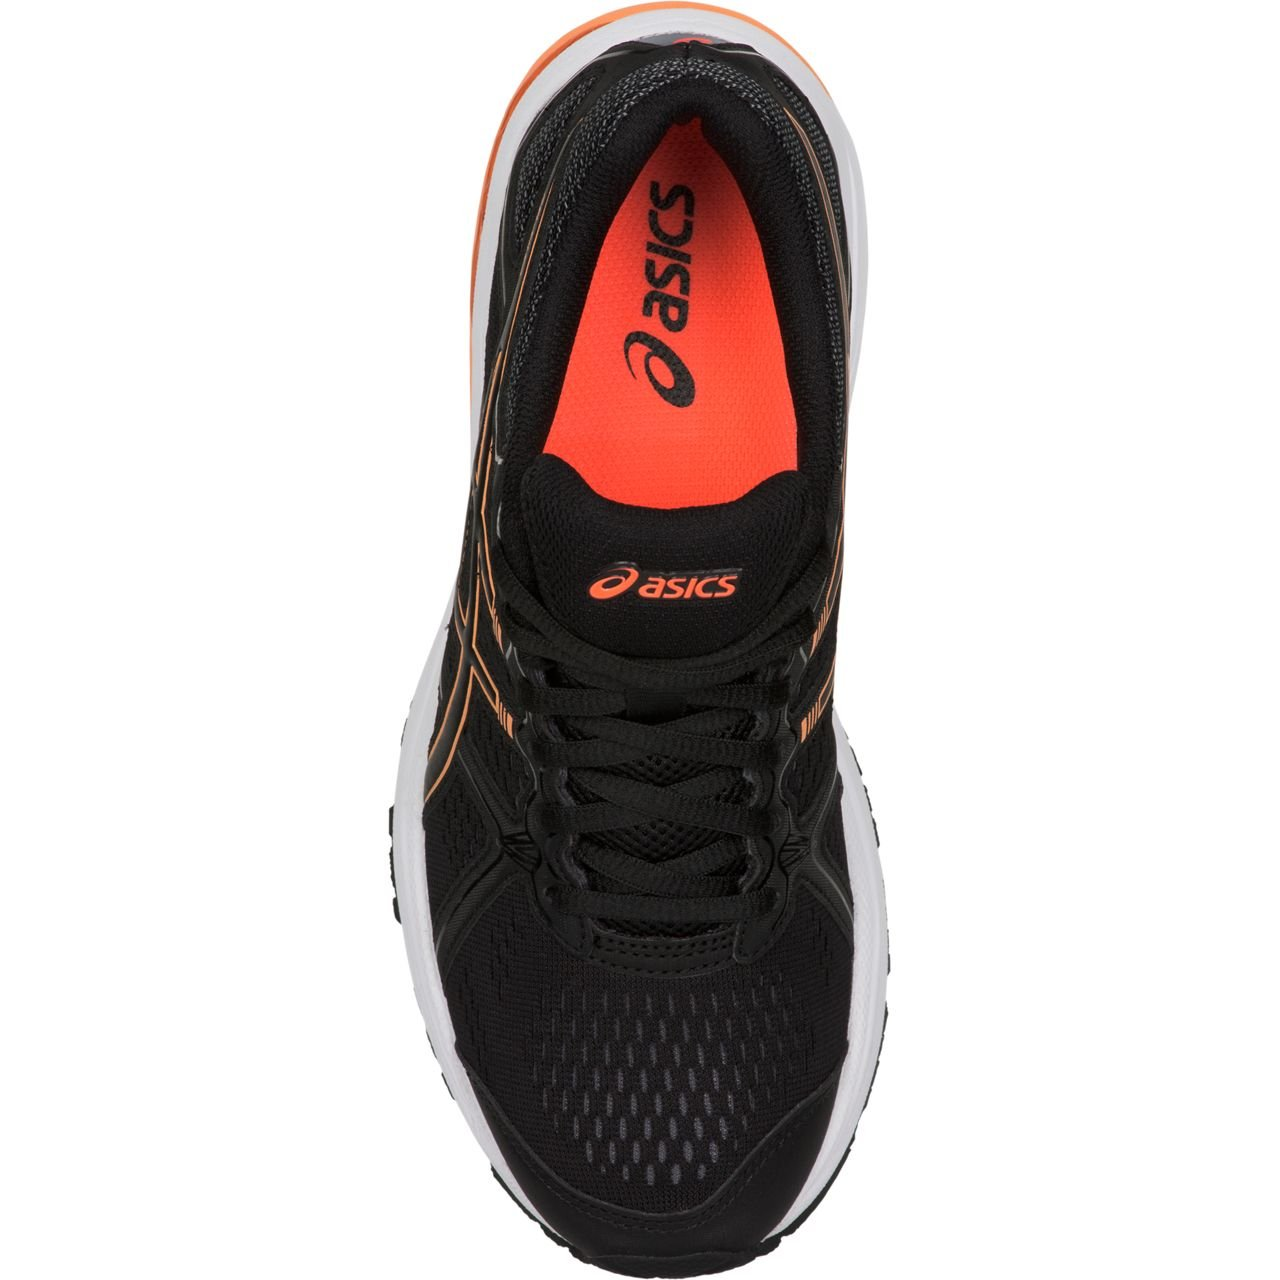 ASICS Women's GT-Xpress Running Shoe B07DJZVPG6 9.5 B(M) US|Black/Mojave